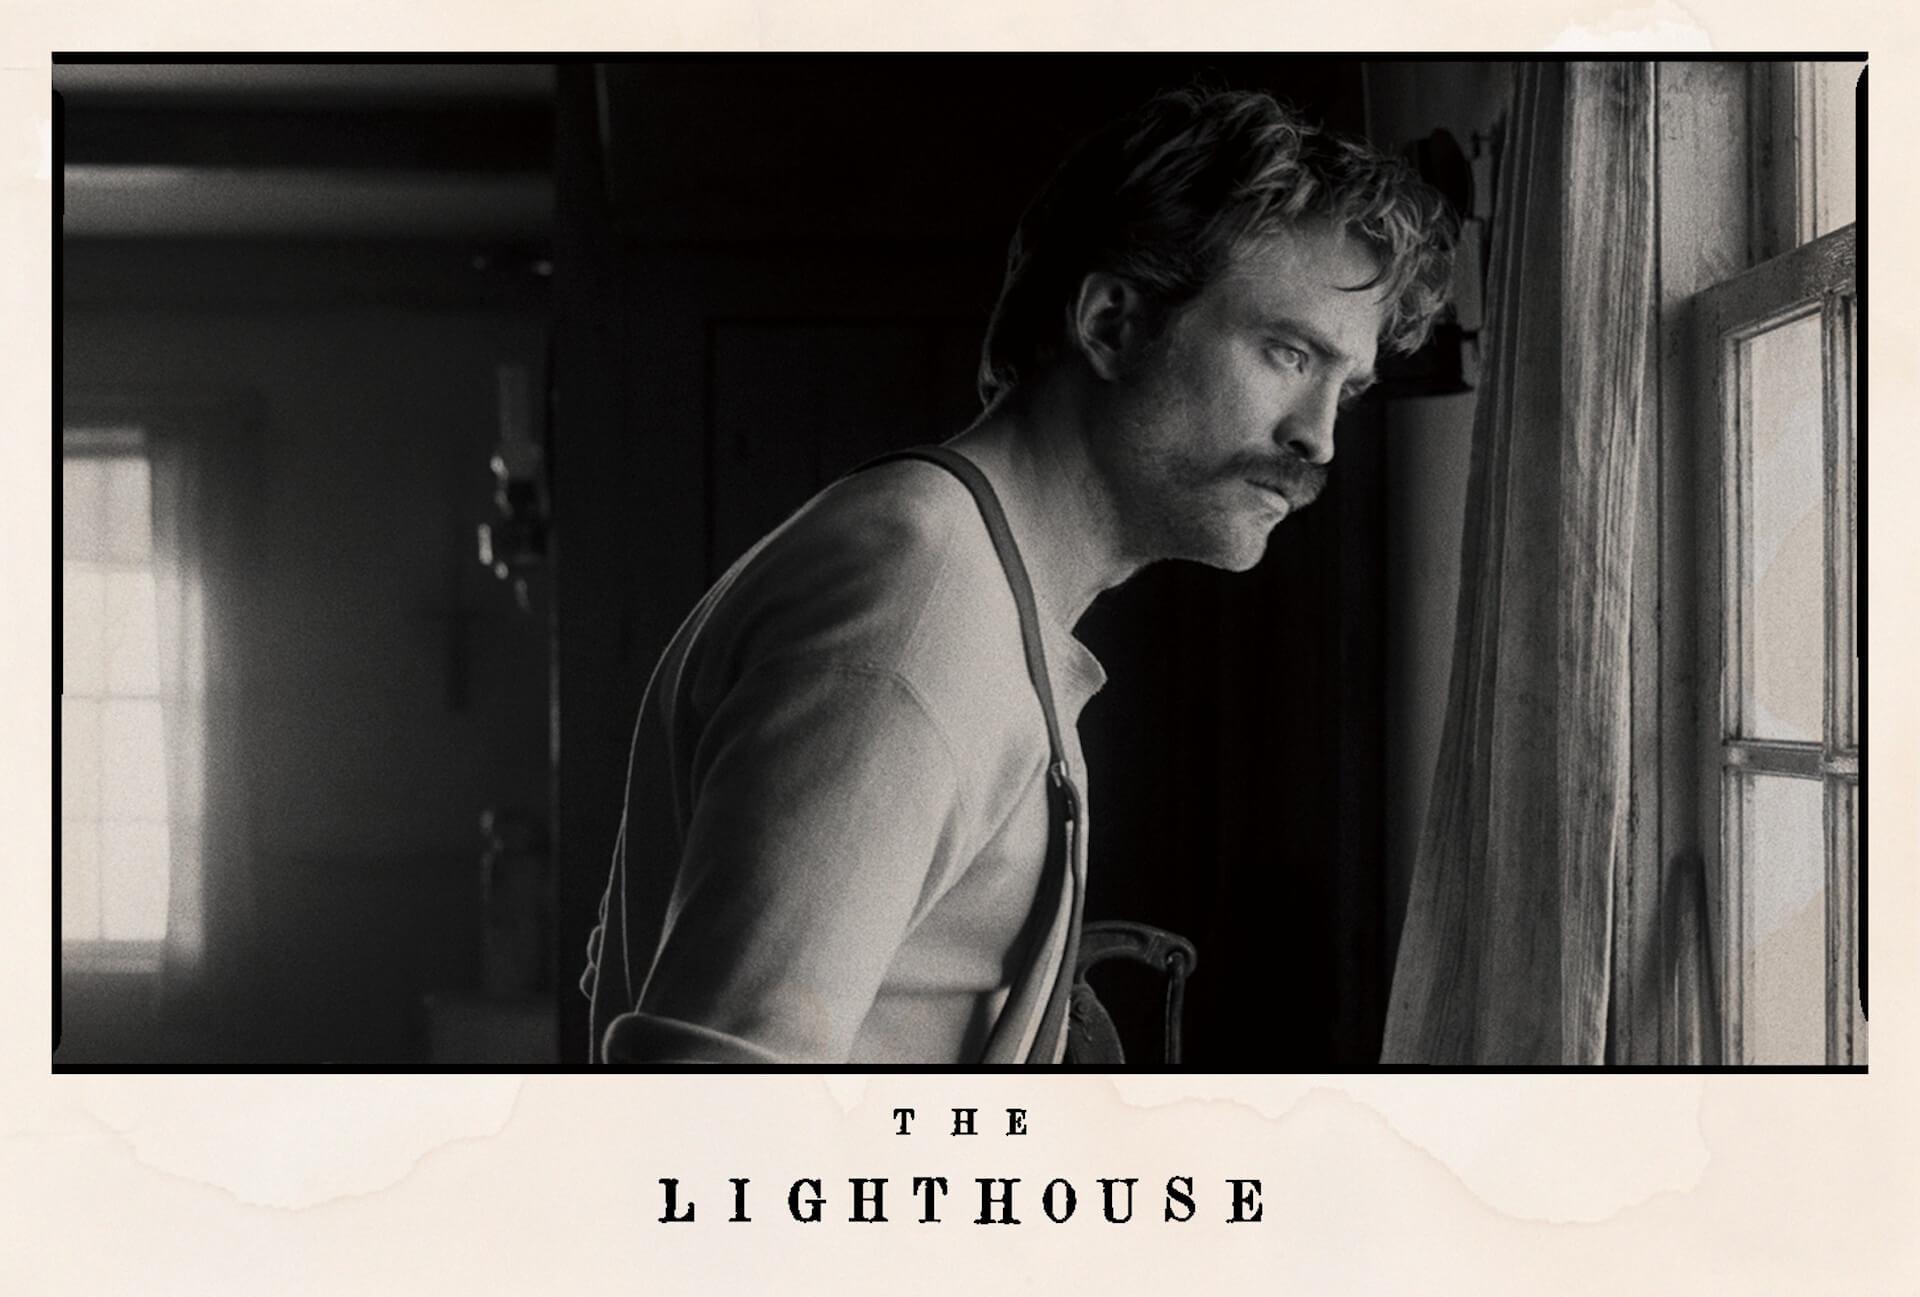 A24、狂気の問題作『ライトハウス』が7月日本公開!シーン写真4点解禁&特典付きムビチケ発売決定 film210326_thelighthouse_2